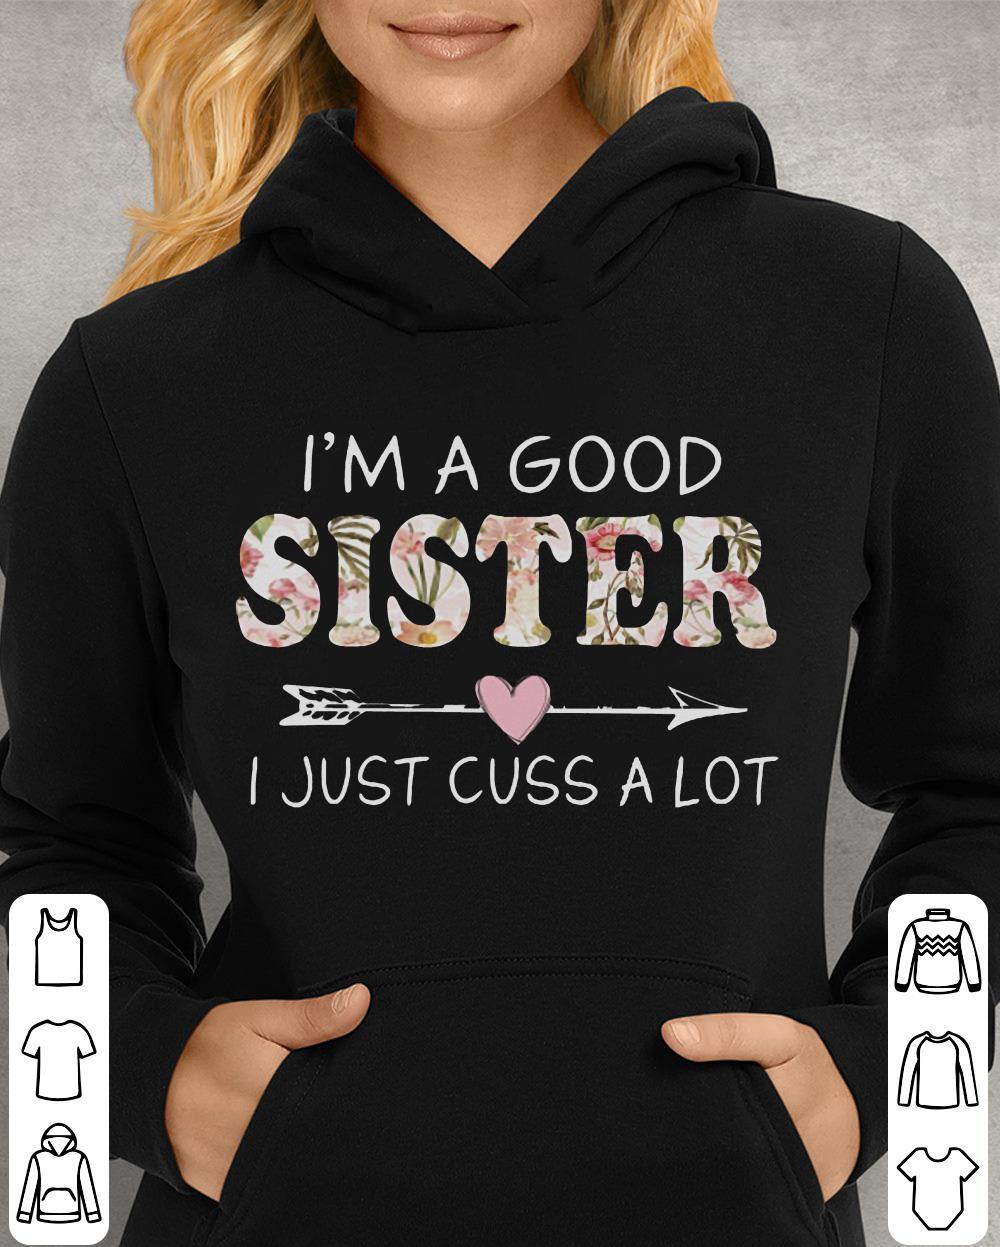 https://unicornshirts.net/images/2018/11/I-m-a-good-sister-I-just-cuss-a-lot-shirt_4.jpg